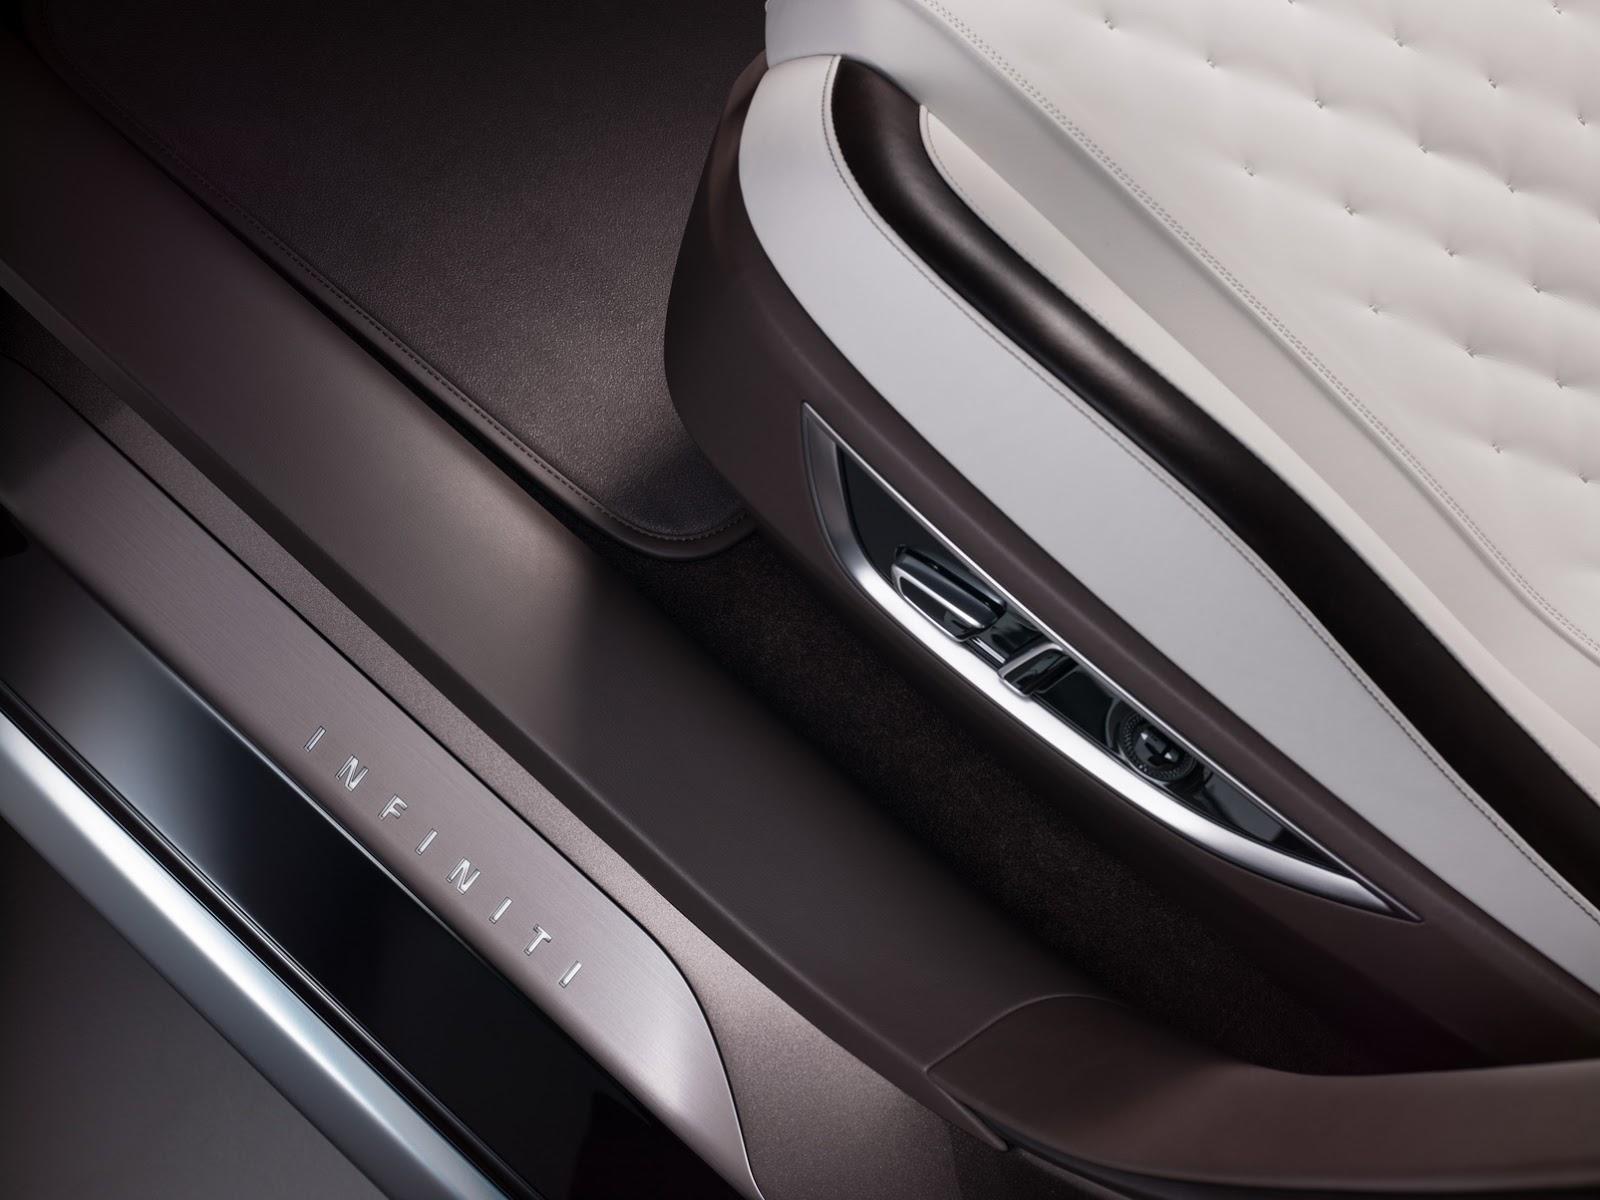 إنفينيتي تعلن عن QX50 كونسيبت بمعرض ديترويت Infinity Infiniti-qx50-concept-arrives-detroit-21